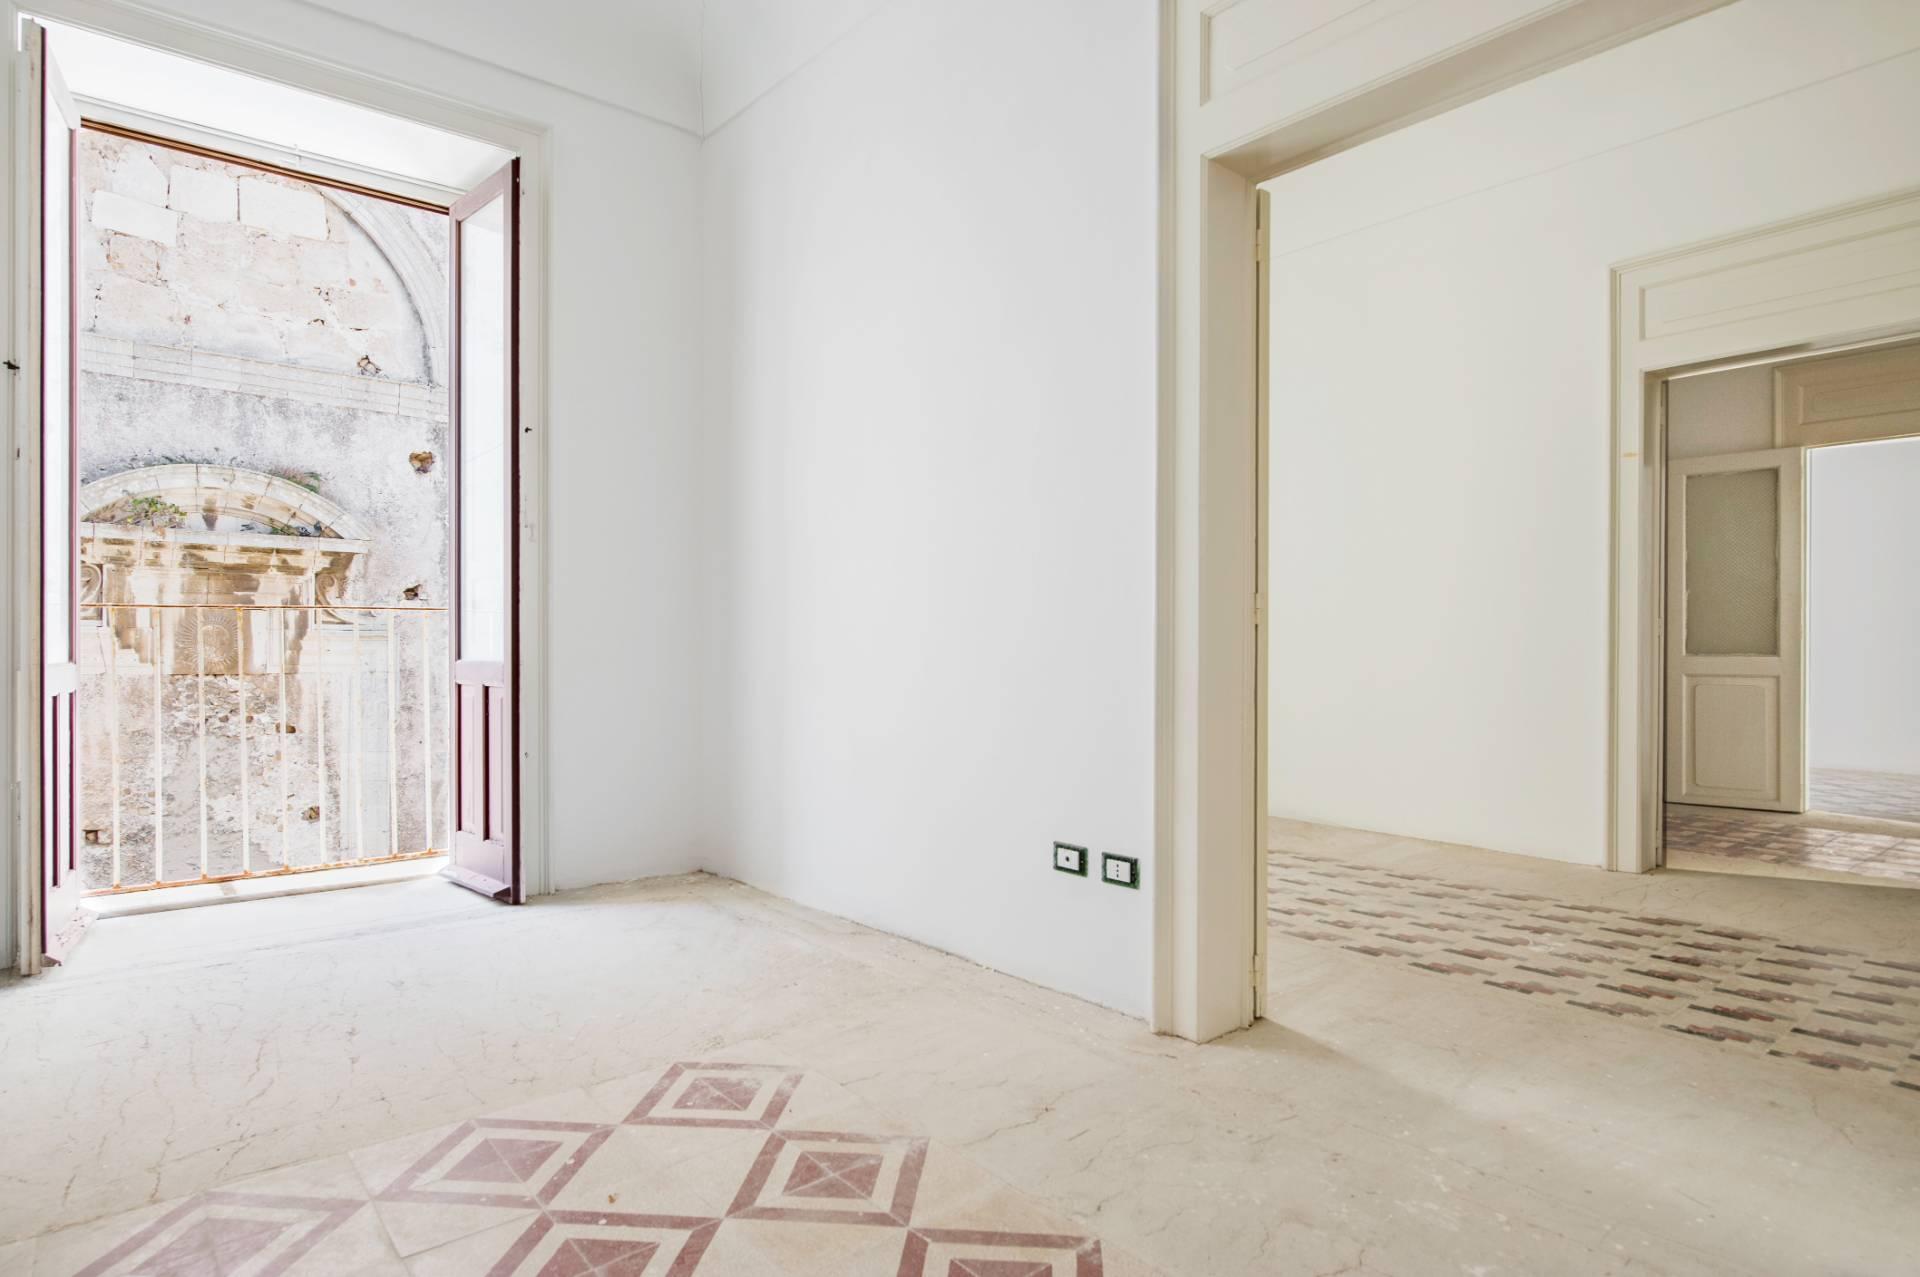 Palazzo in Vendita a Siracusa: 5 locali, 500 mq - Foto 5